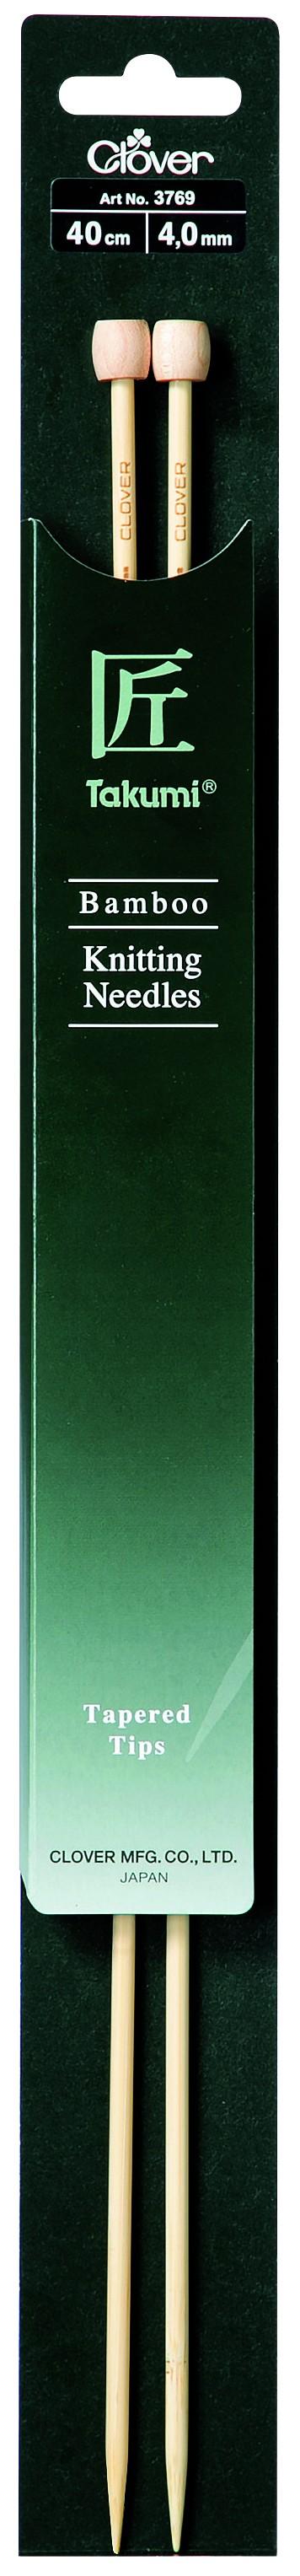 CLOVER Jackenstrickndl. Bambus Takumi 40cm/4.00mm